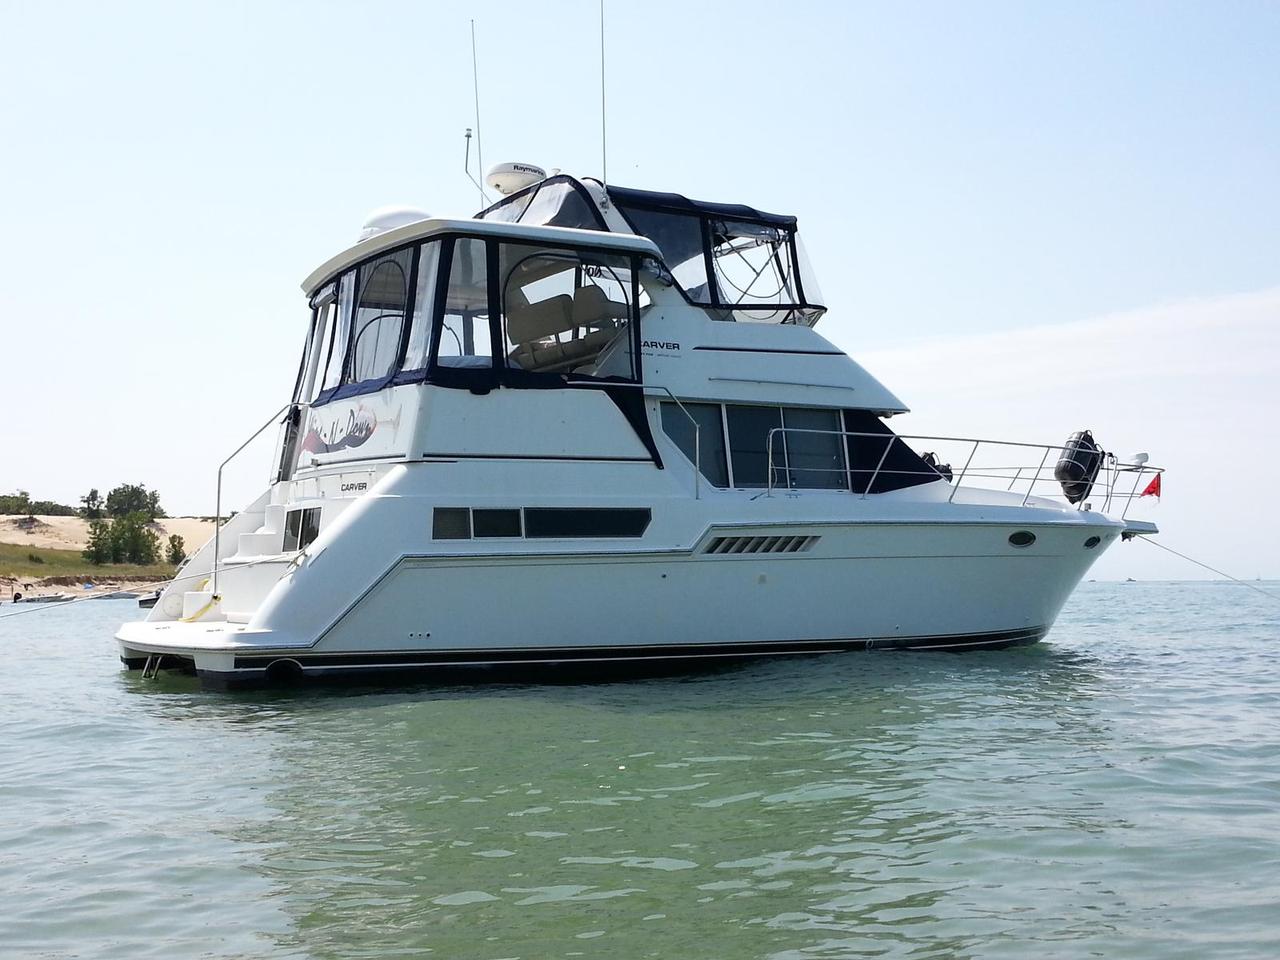 1998 Used Carver 355 Aft Cabin Motor Yacht Cruiser Boat